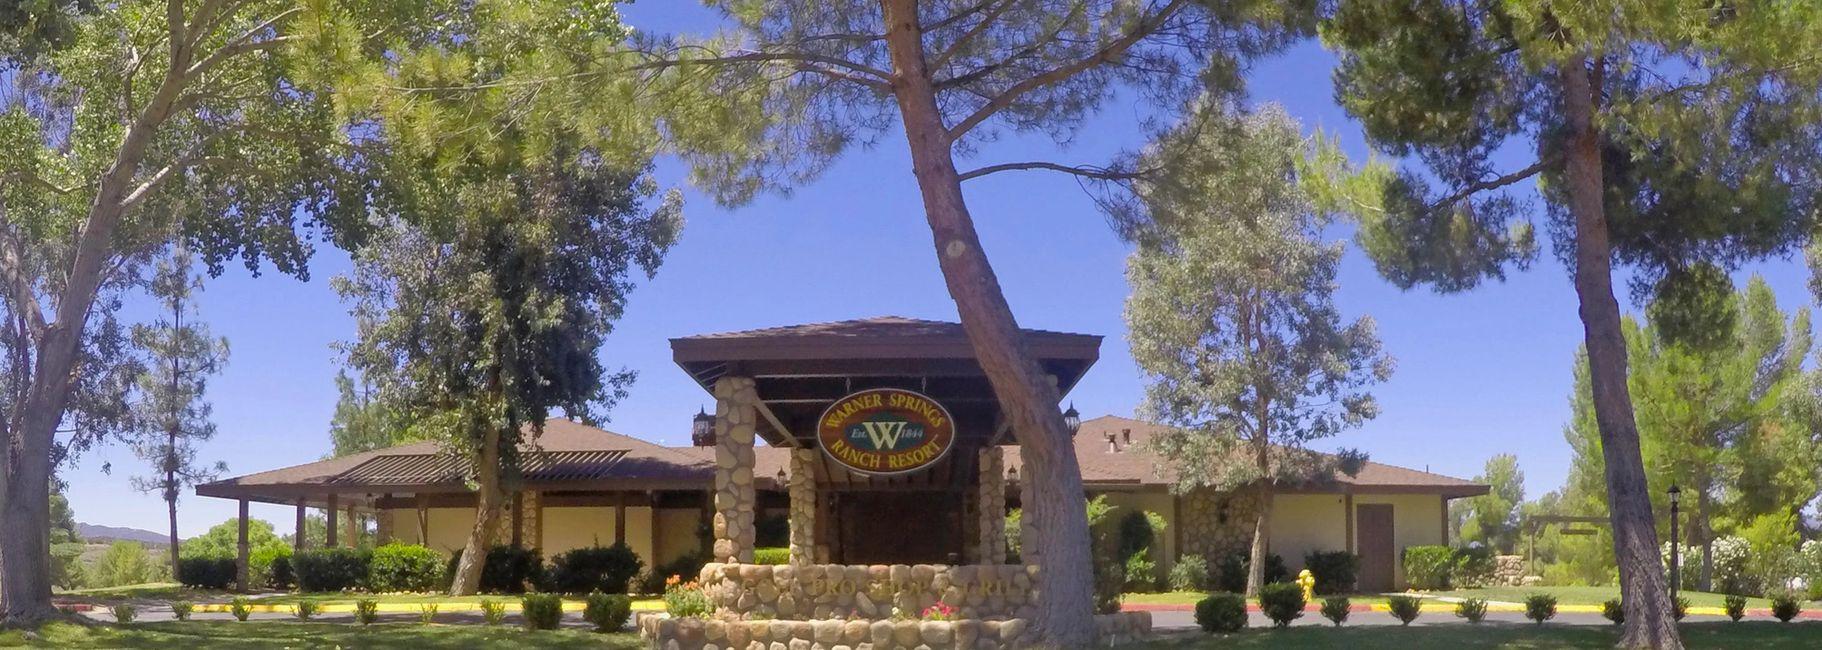 Haciendo Golf Club California Map.Warner Springs Ranch Golf Pacific Hospitality Group